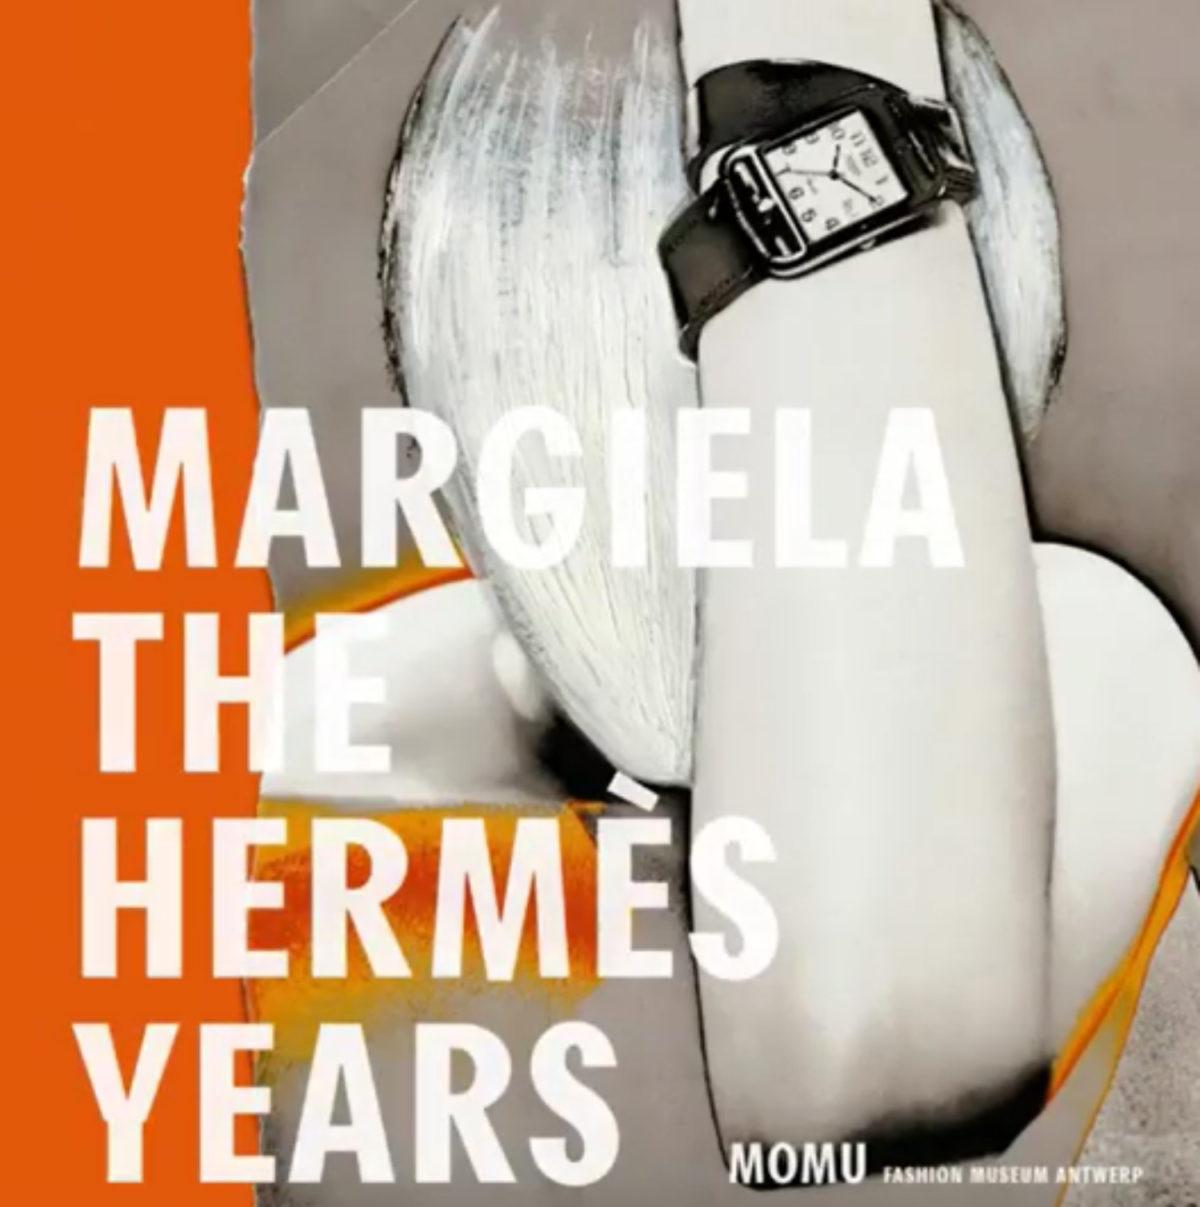 Maison Margiela Hermès Retrospektive Ausstellung Antwerpen